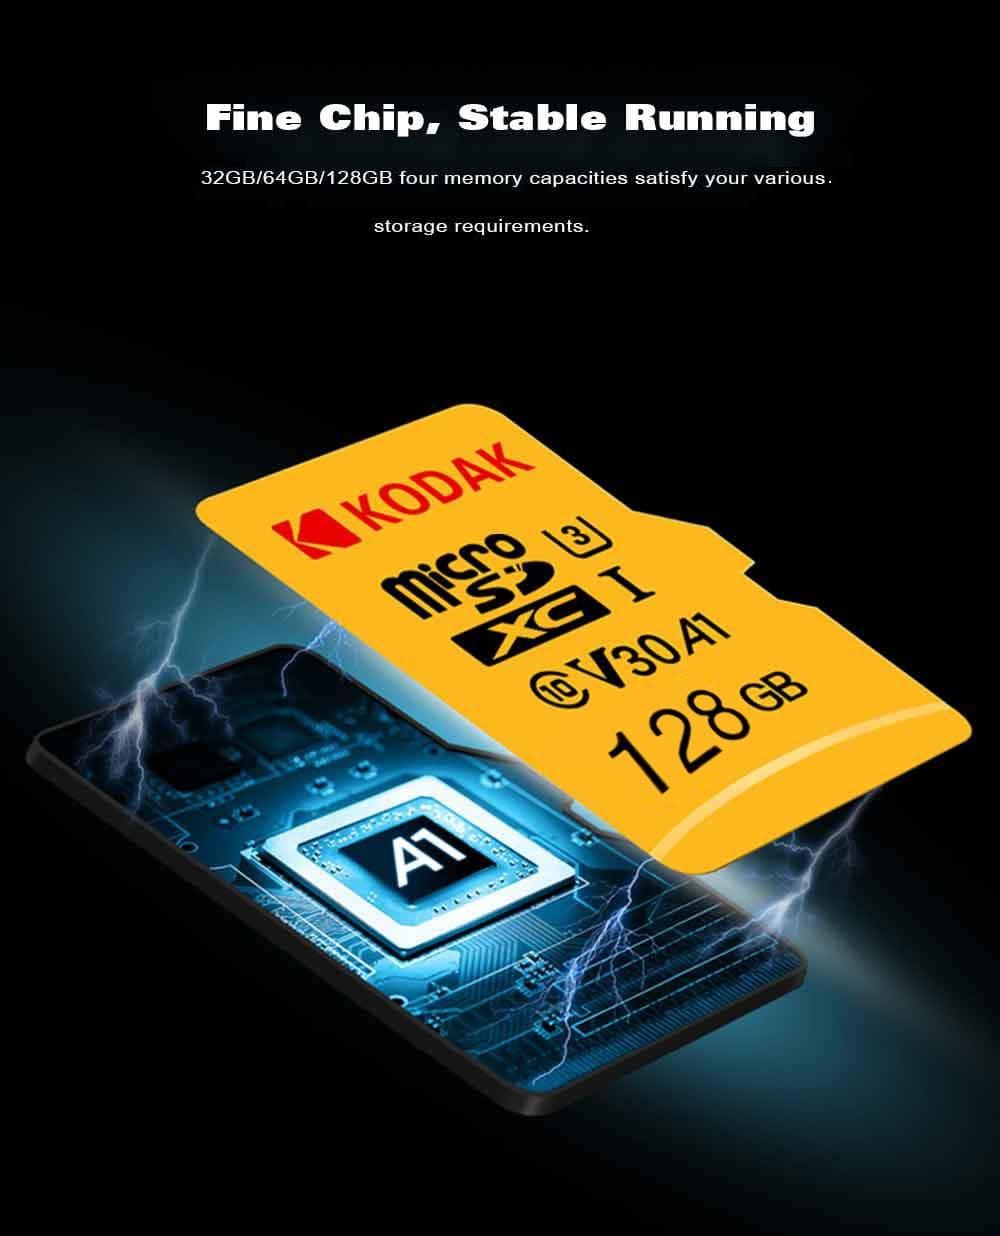 Memoria Micro SD Kodak buen chip